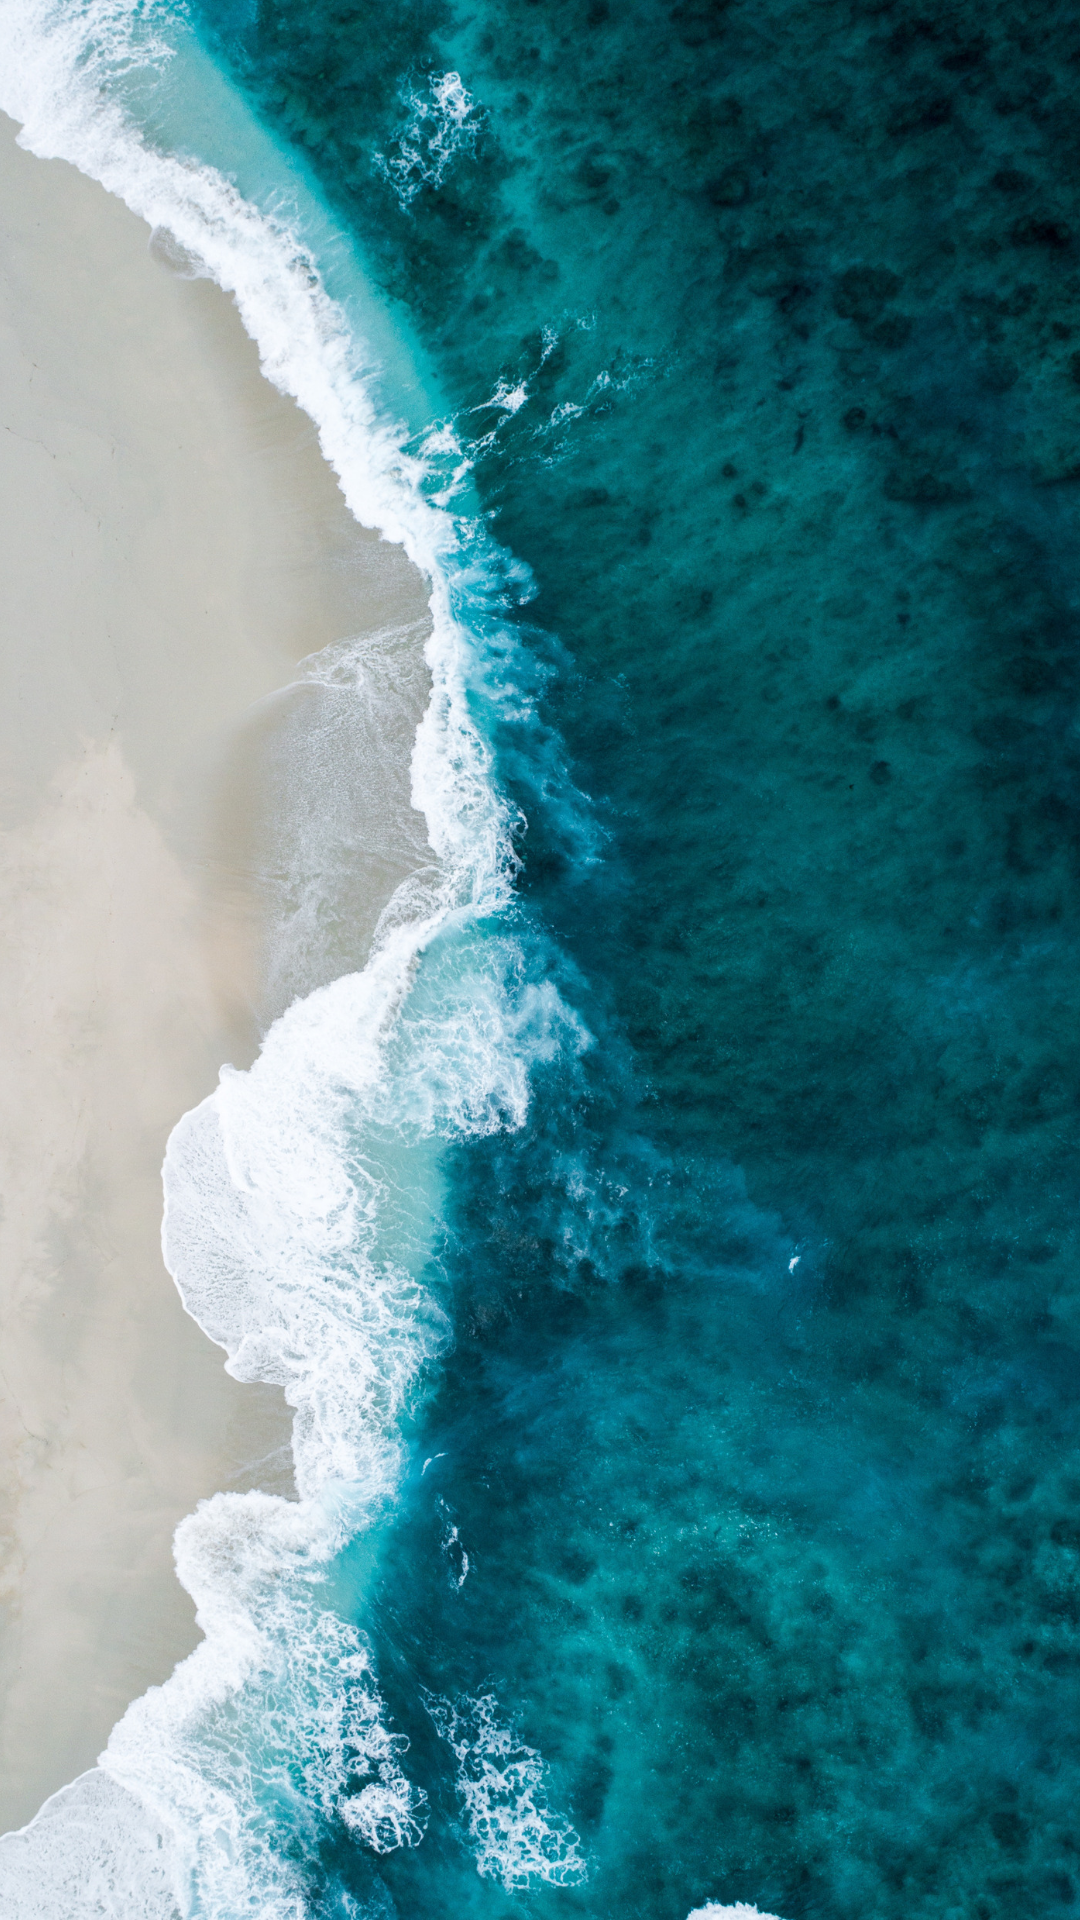 Wallpaper ideas. Ocean waves. Water theme wallpapers